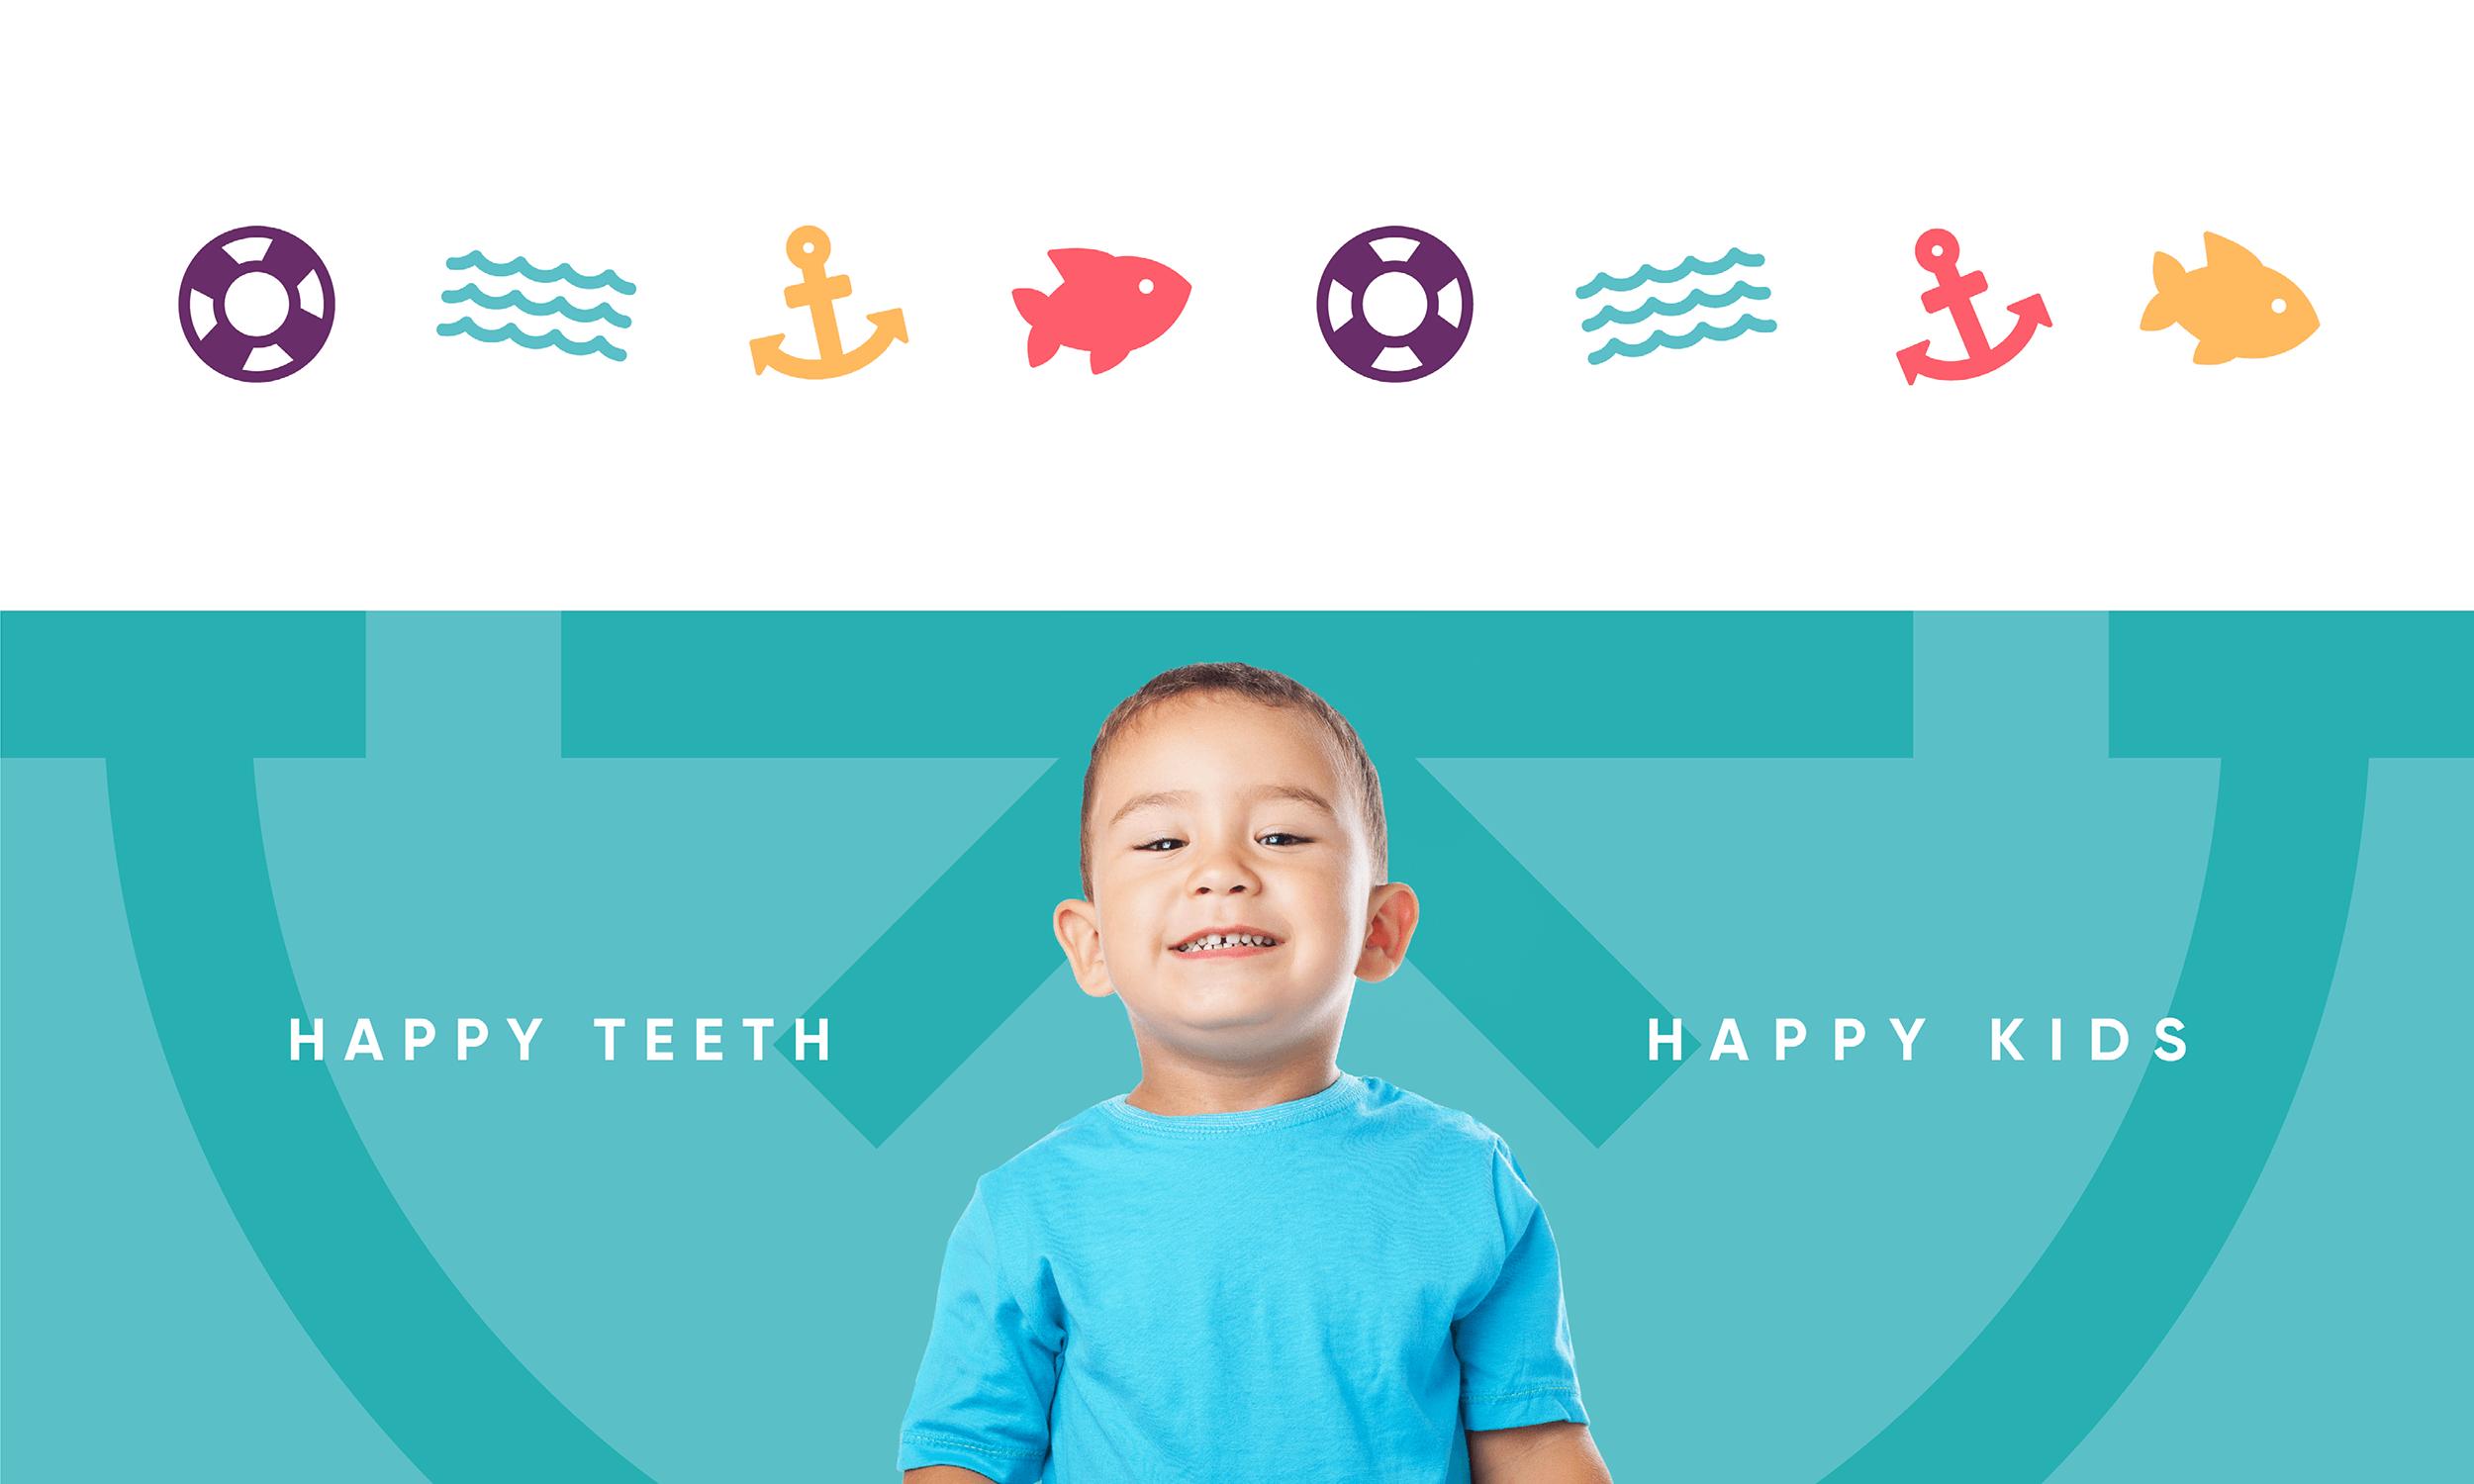 Capistrano-Childrens-Dentistry-Logo-Design-Freelance-Graphic-Designer-Margate-Kent-Presentation-Pediatric-Dental-Logo-Icons